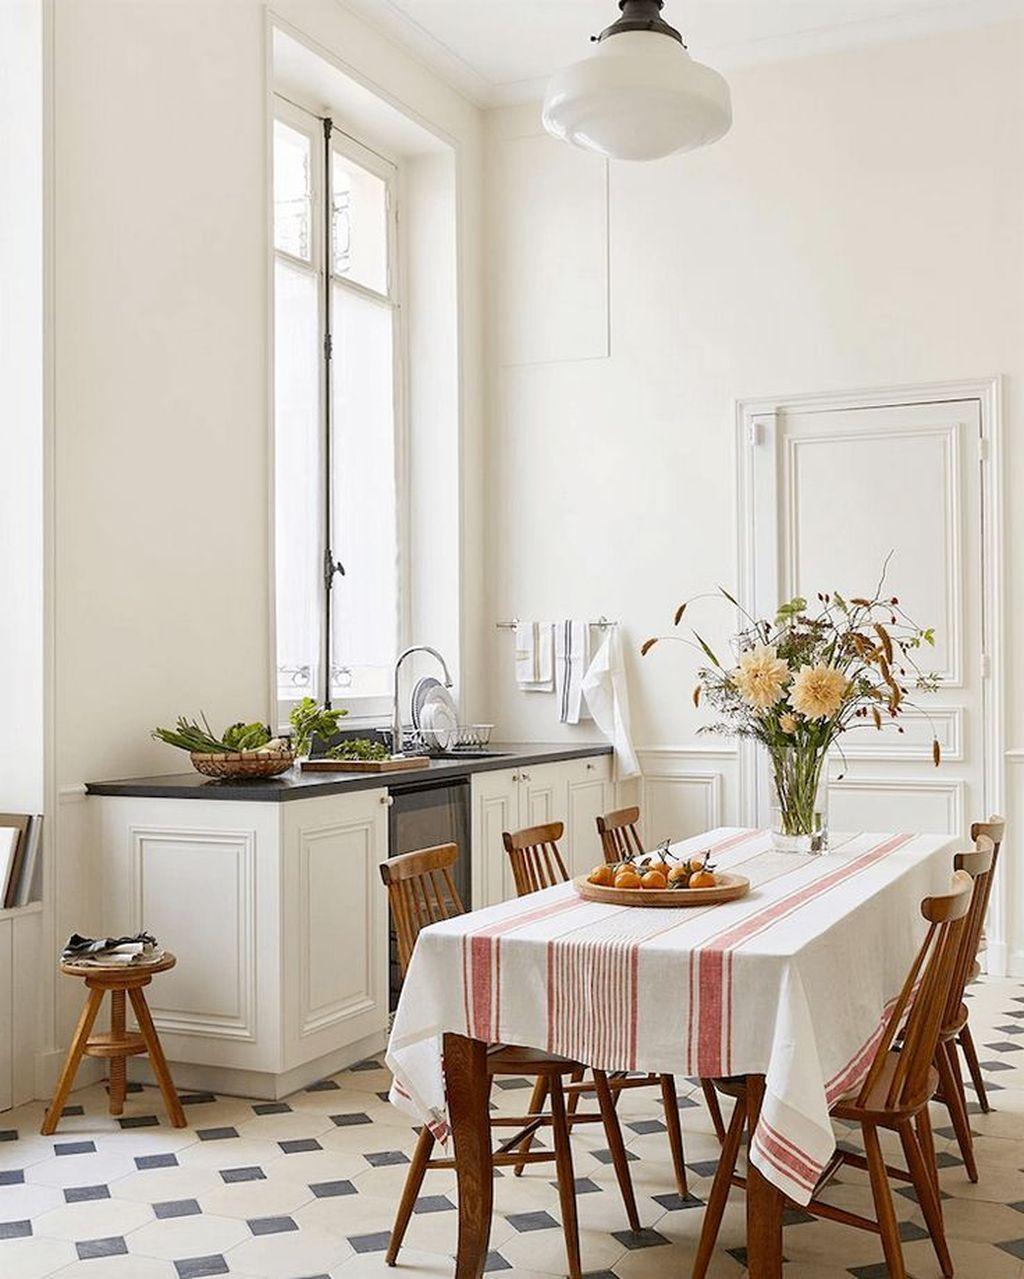 Popular Apartment Kitchen Design Ideas You Should Copy 19